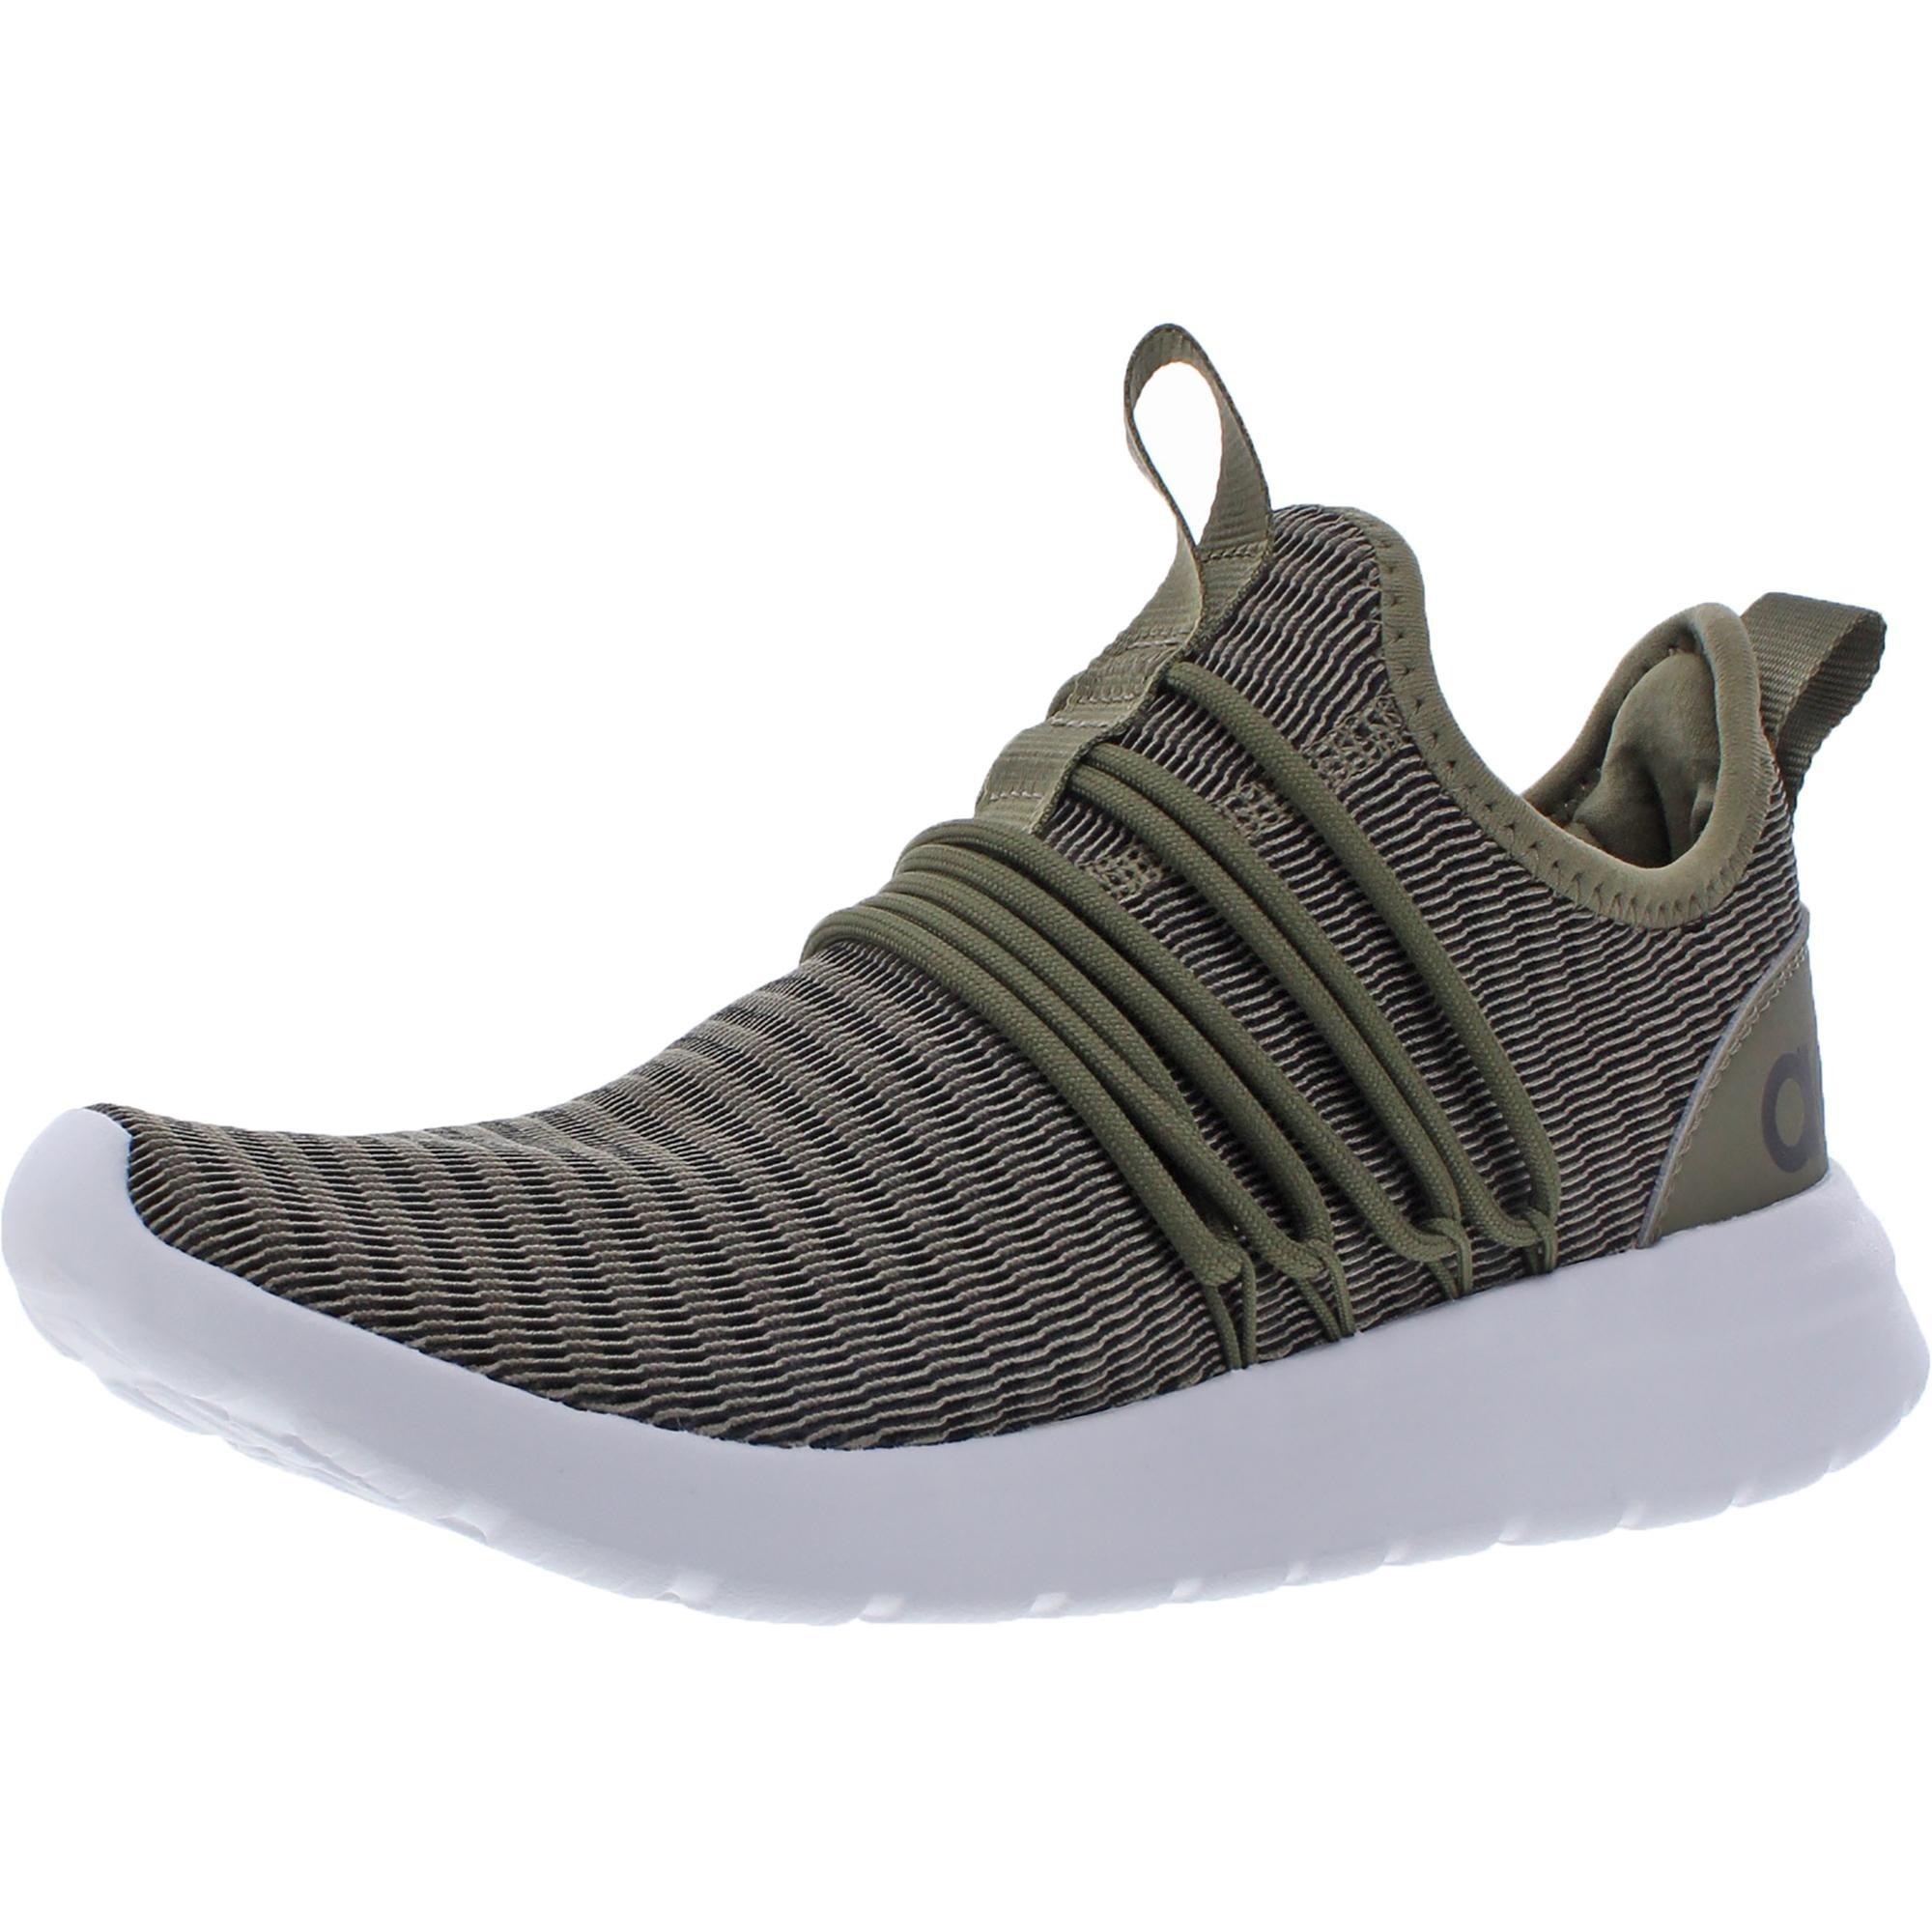 Especificado Vaca kiwi  Shop Adidas Mens Lite Racer Adapt Running Shoes Mesh Stretch - Raw  Khaki/Raw Khaki/Core Black - Overstock - 32299450